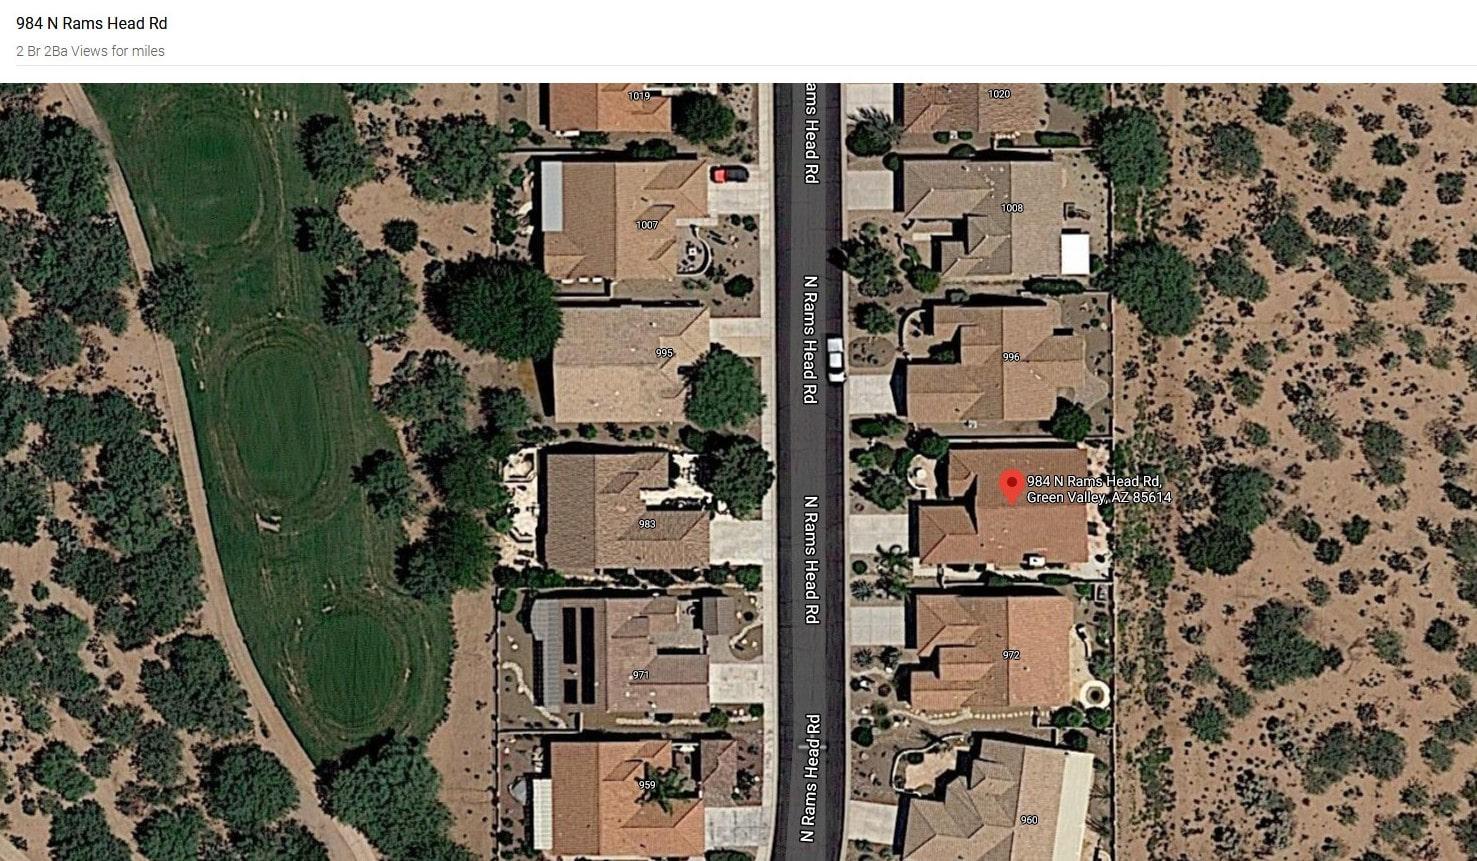 Google Satellite